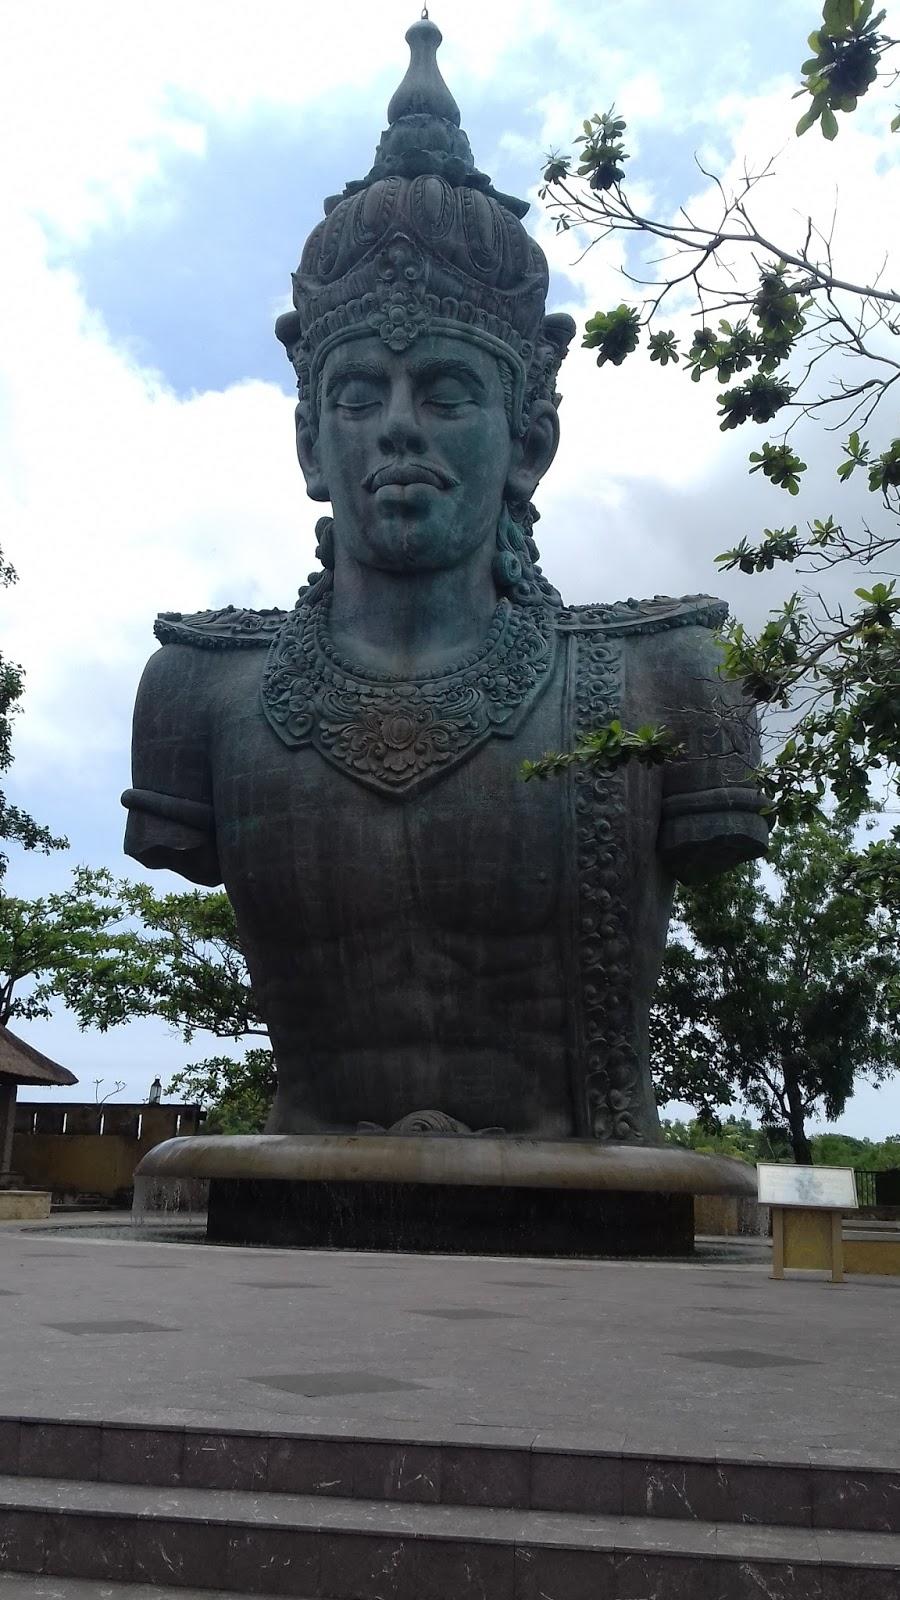 Objek Wisata Garuda Wisnu Kencana Bali Gwk Enjoy Bali Travel